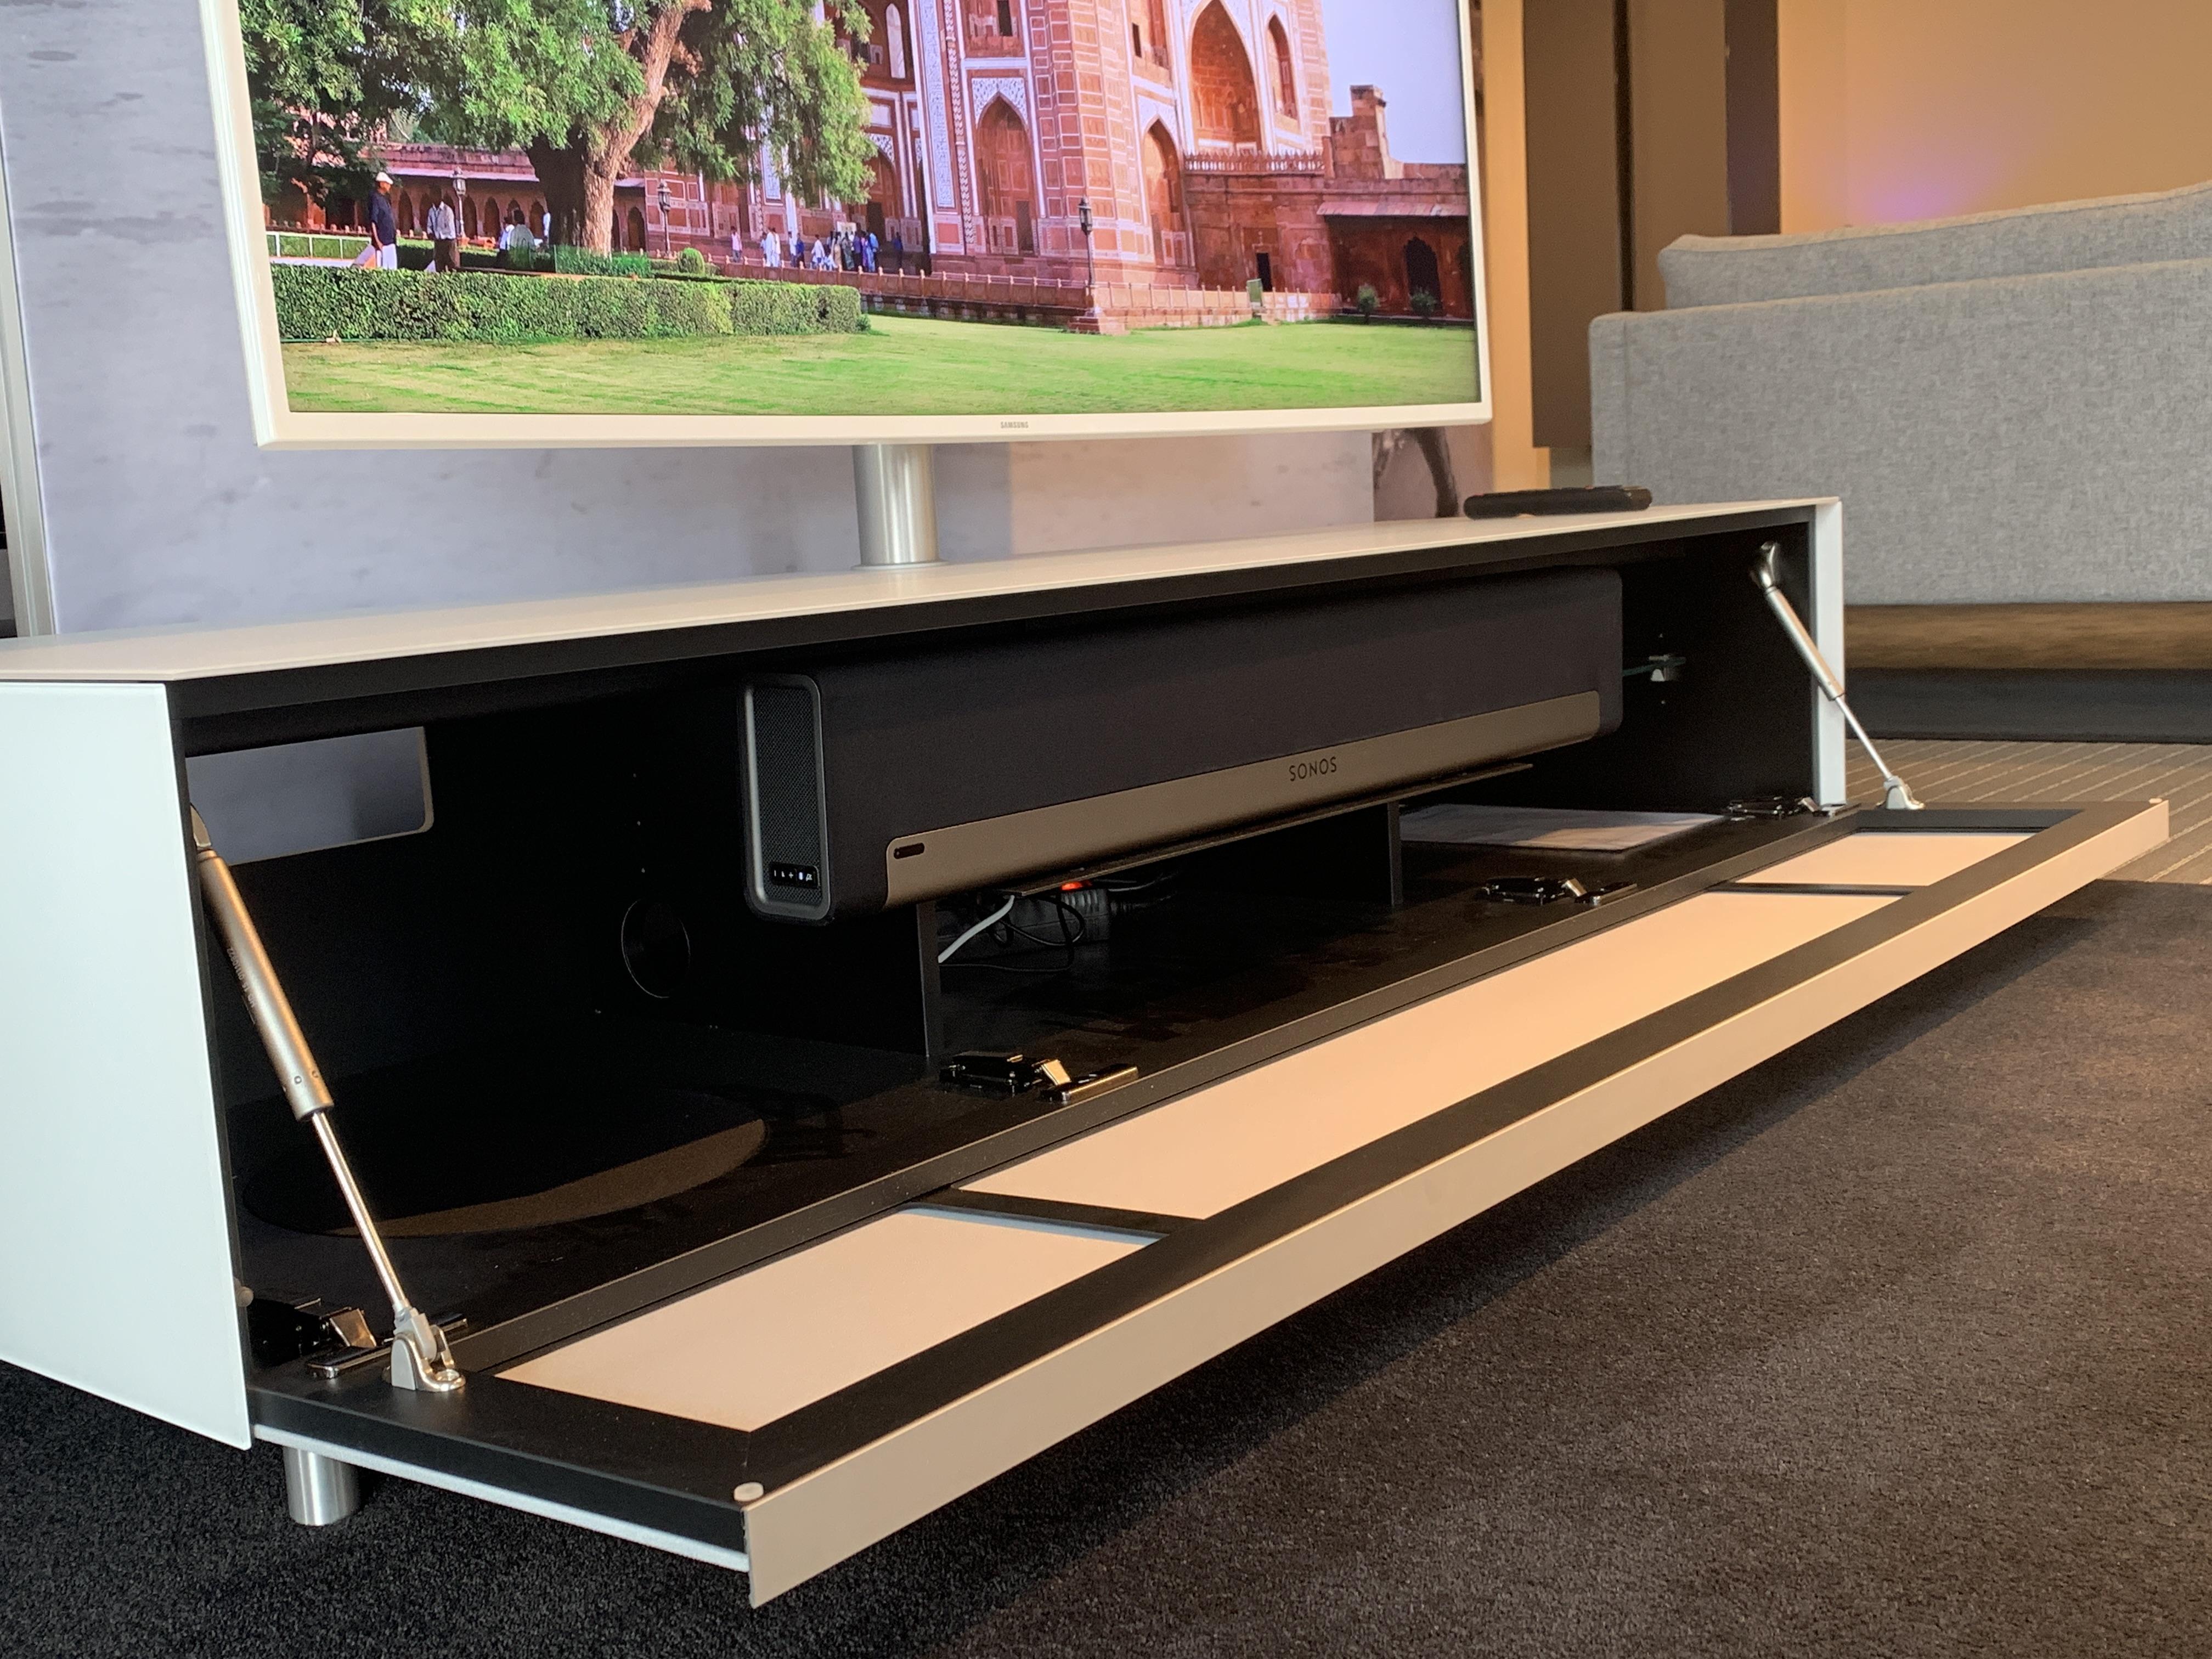 Spectral soundbar tv-meubel 1.65m incl. draaibare tv-beugel